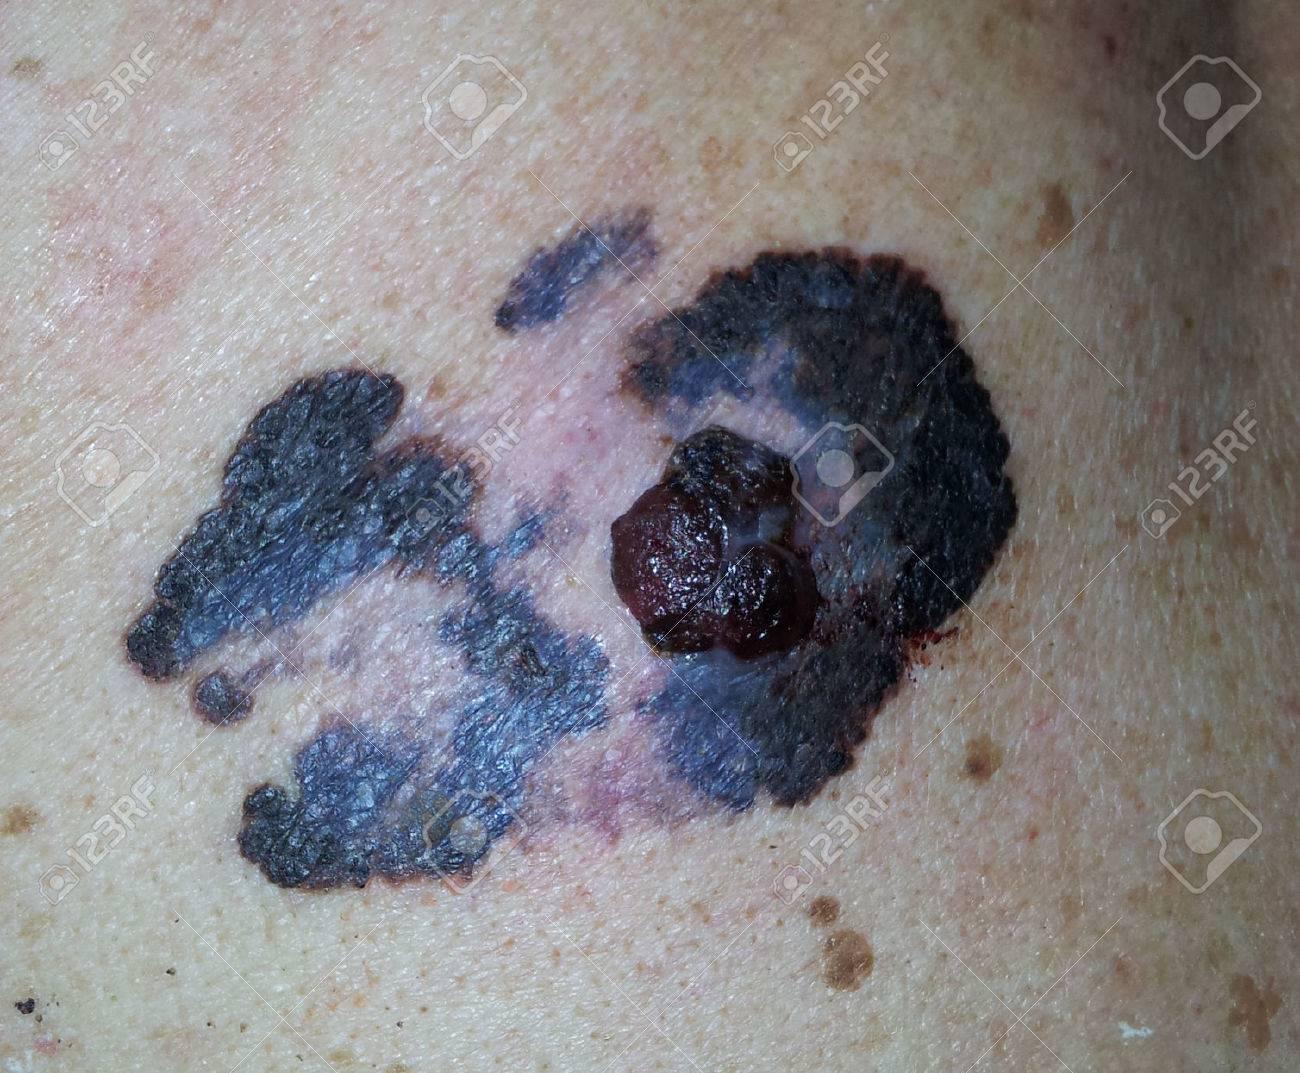 http://n3.datasn.io/data/api/v1/n3zm/image_of_skin_disease_5/main/skin_disease_image_download//71/cc/67/ca/71cc67caf08c9ca505c584a8f9a8f4e2004dbf49.jpg